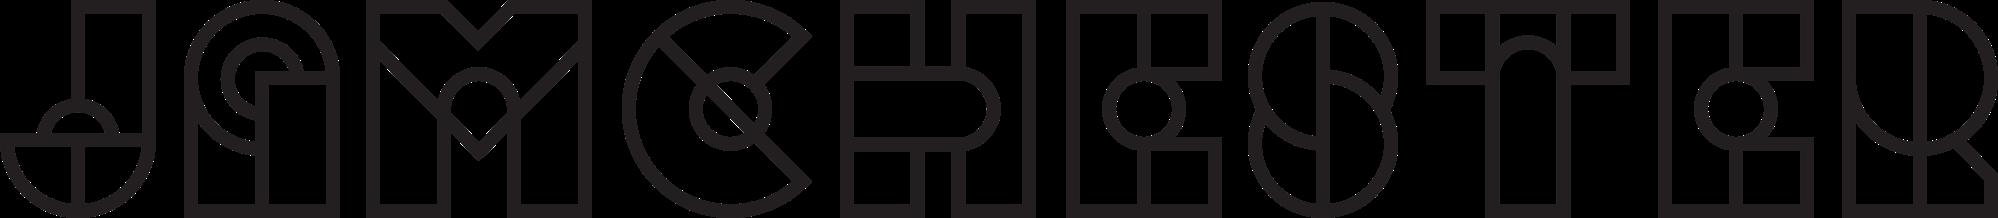 Jamchester logo